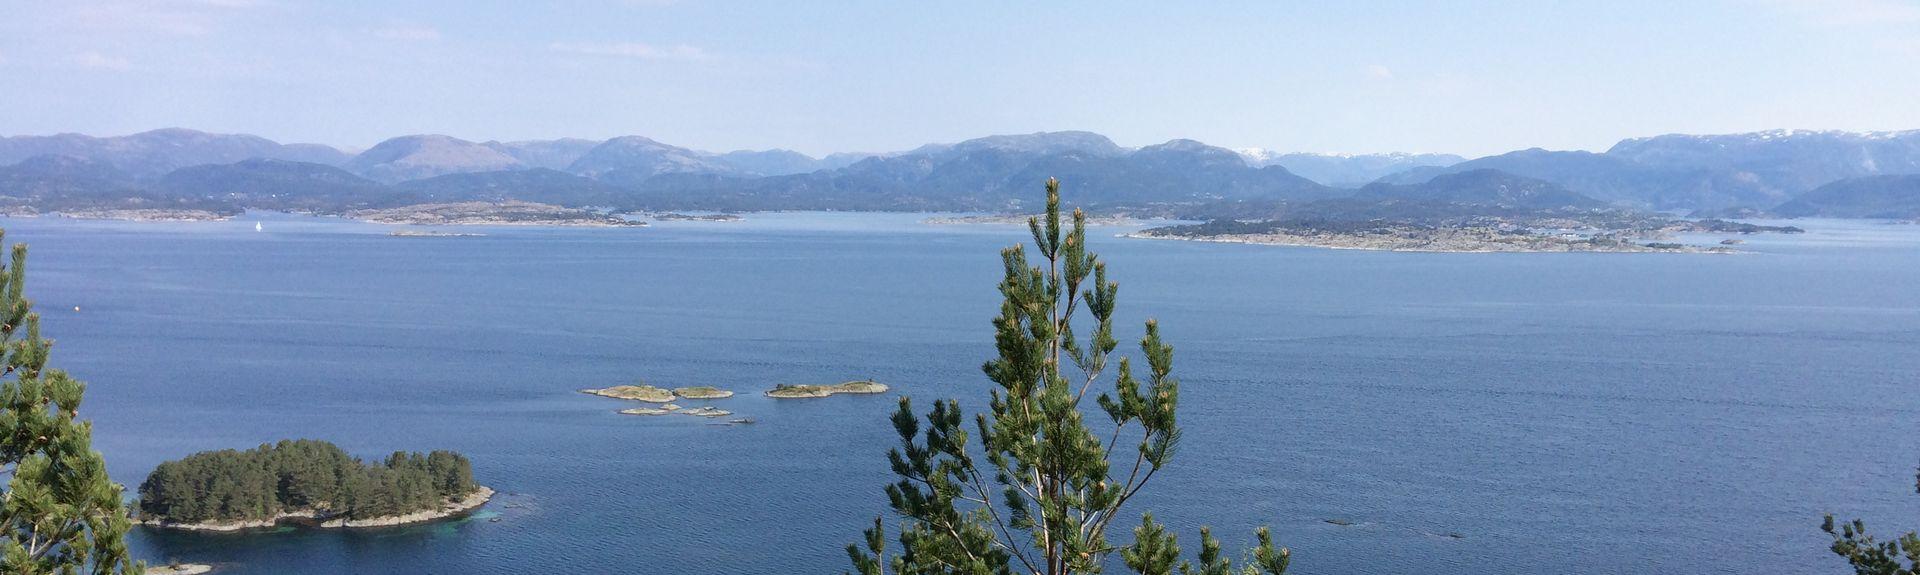 Bøvågen, Norway